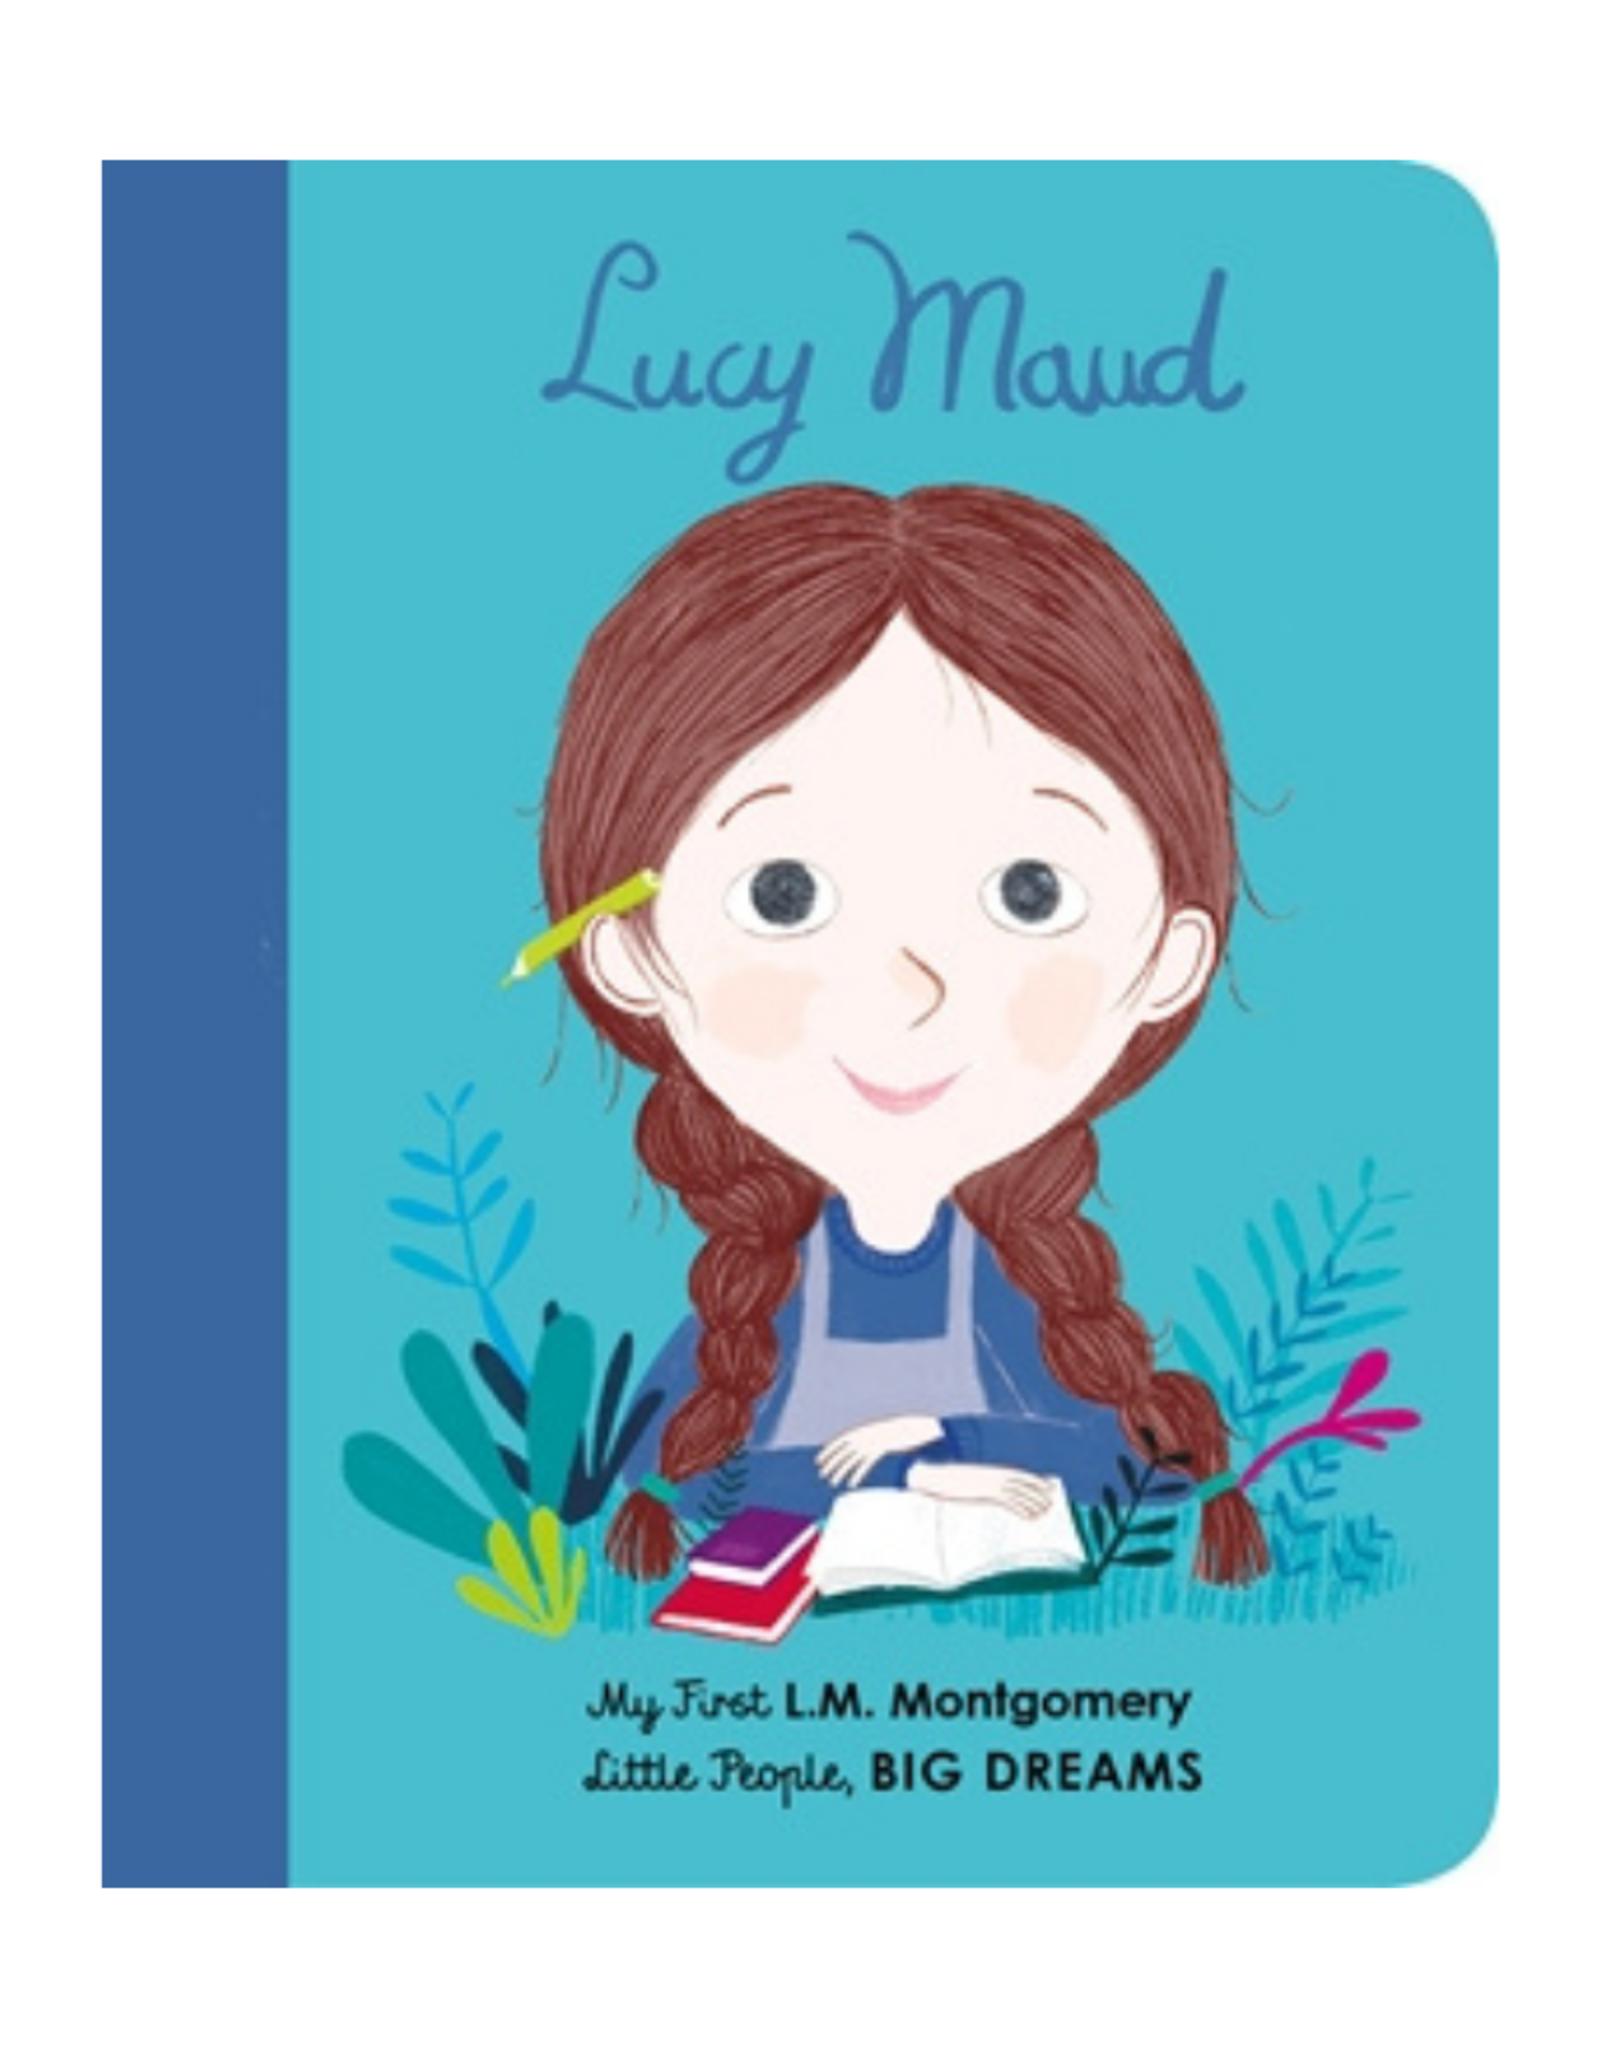 My First Lucy Maud Montgomery by Isabel Sanchez Vegara and Natascha Rosenberg